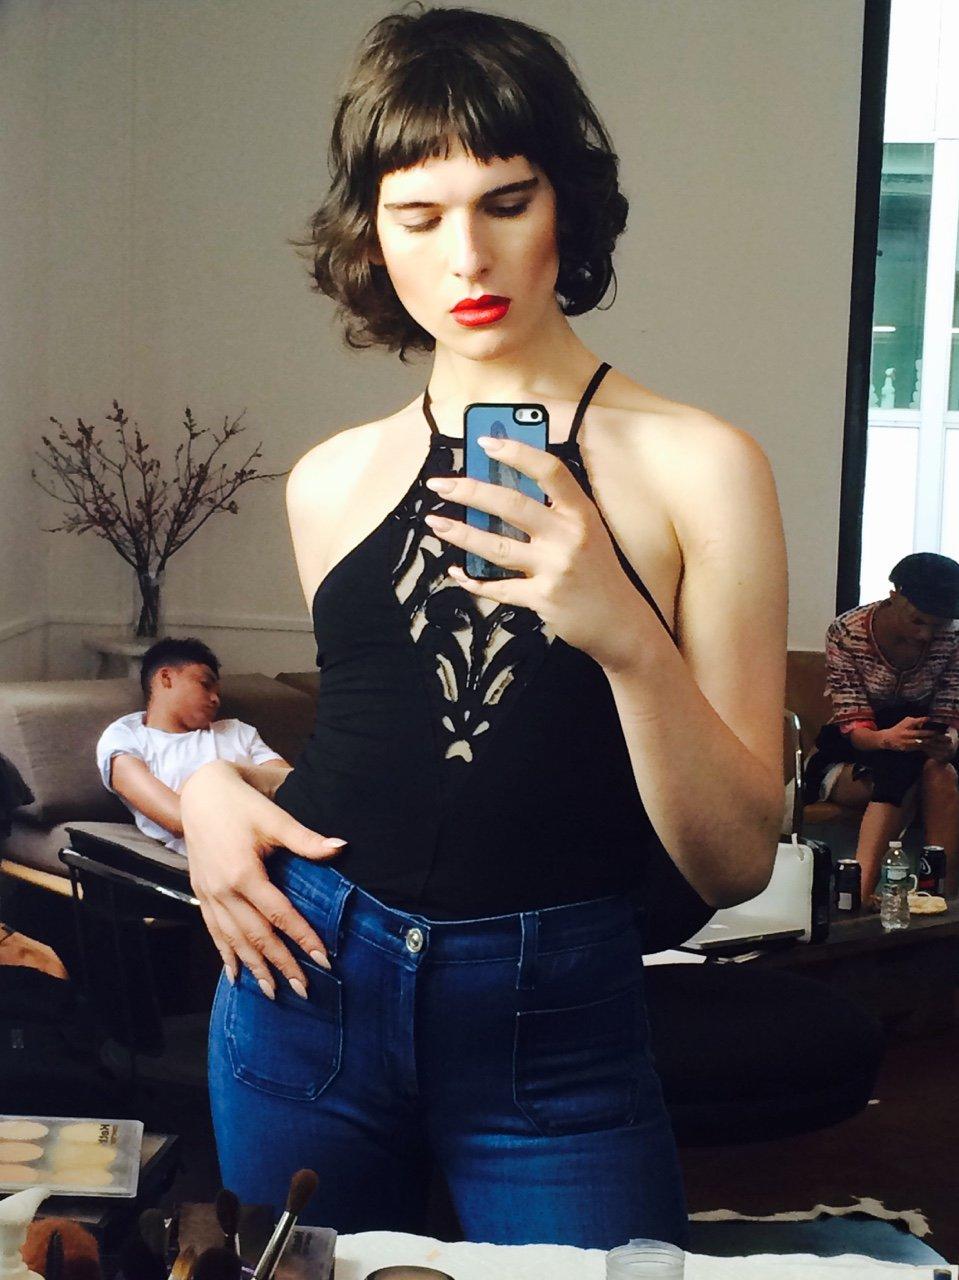 Modelo transgénero Hari Nef, 24 anos